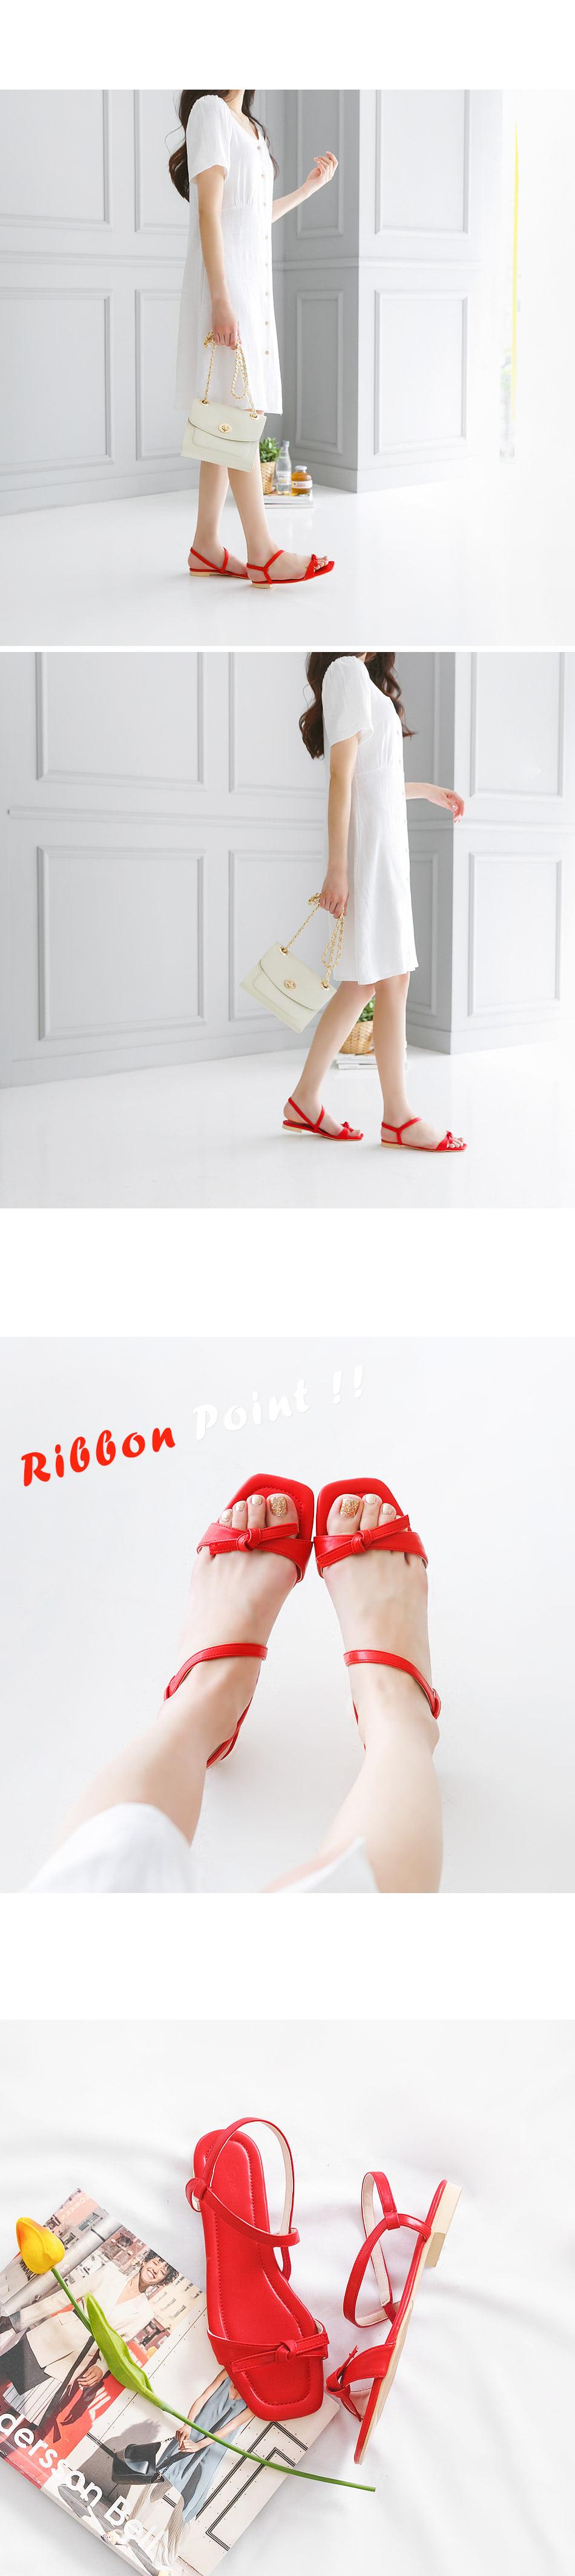 Ritelon Slingback Sandals 1.5cm